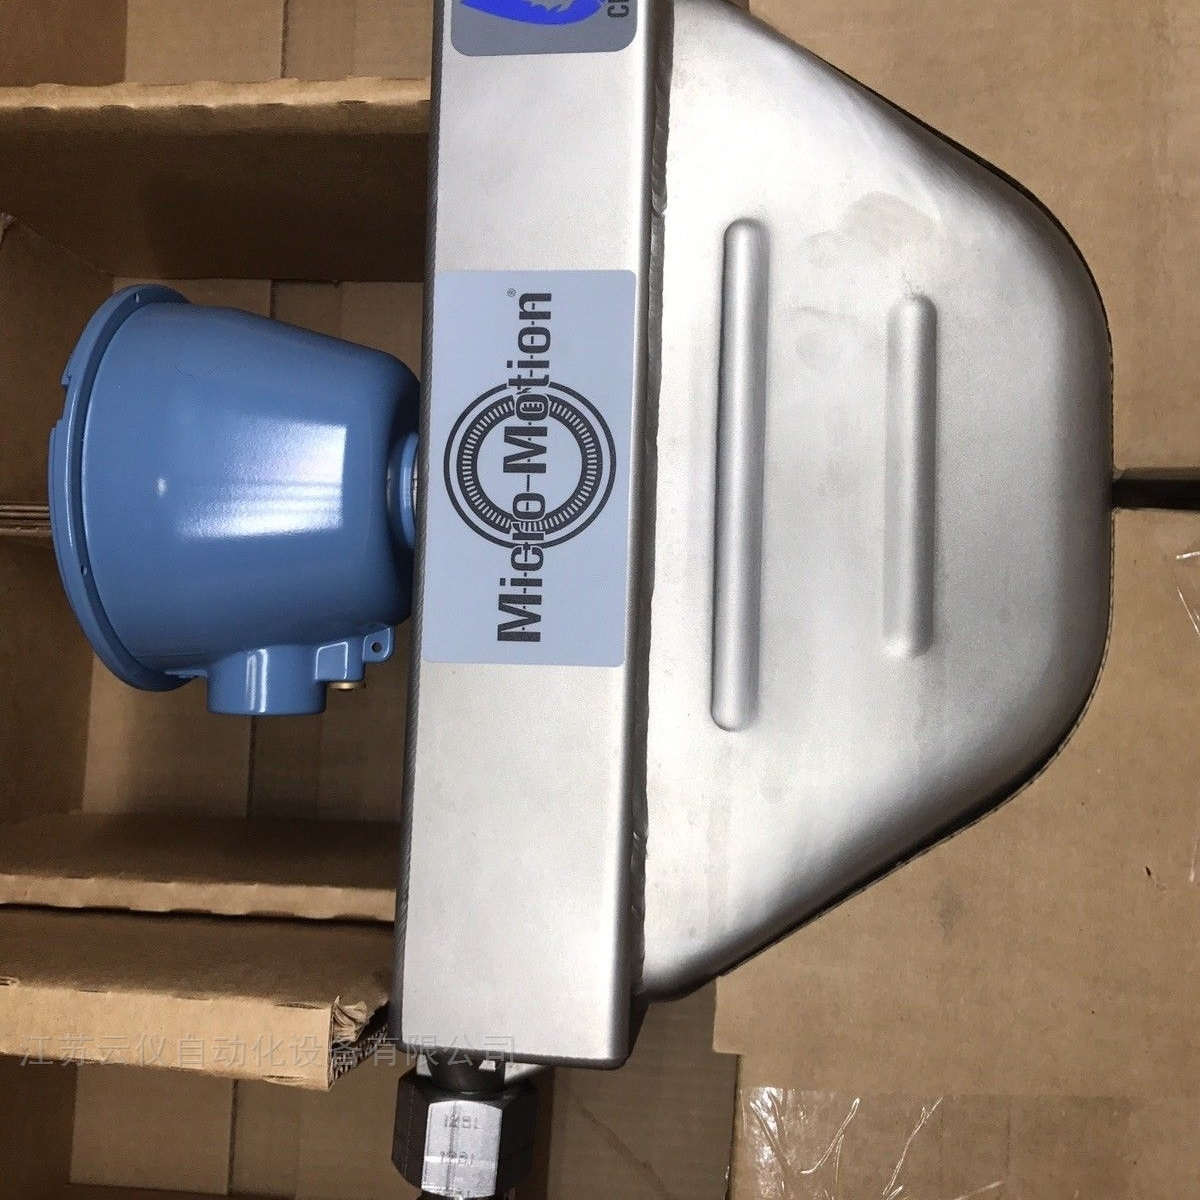 Micro CNG050 压缩天然气质量流量计